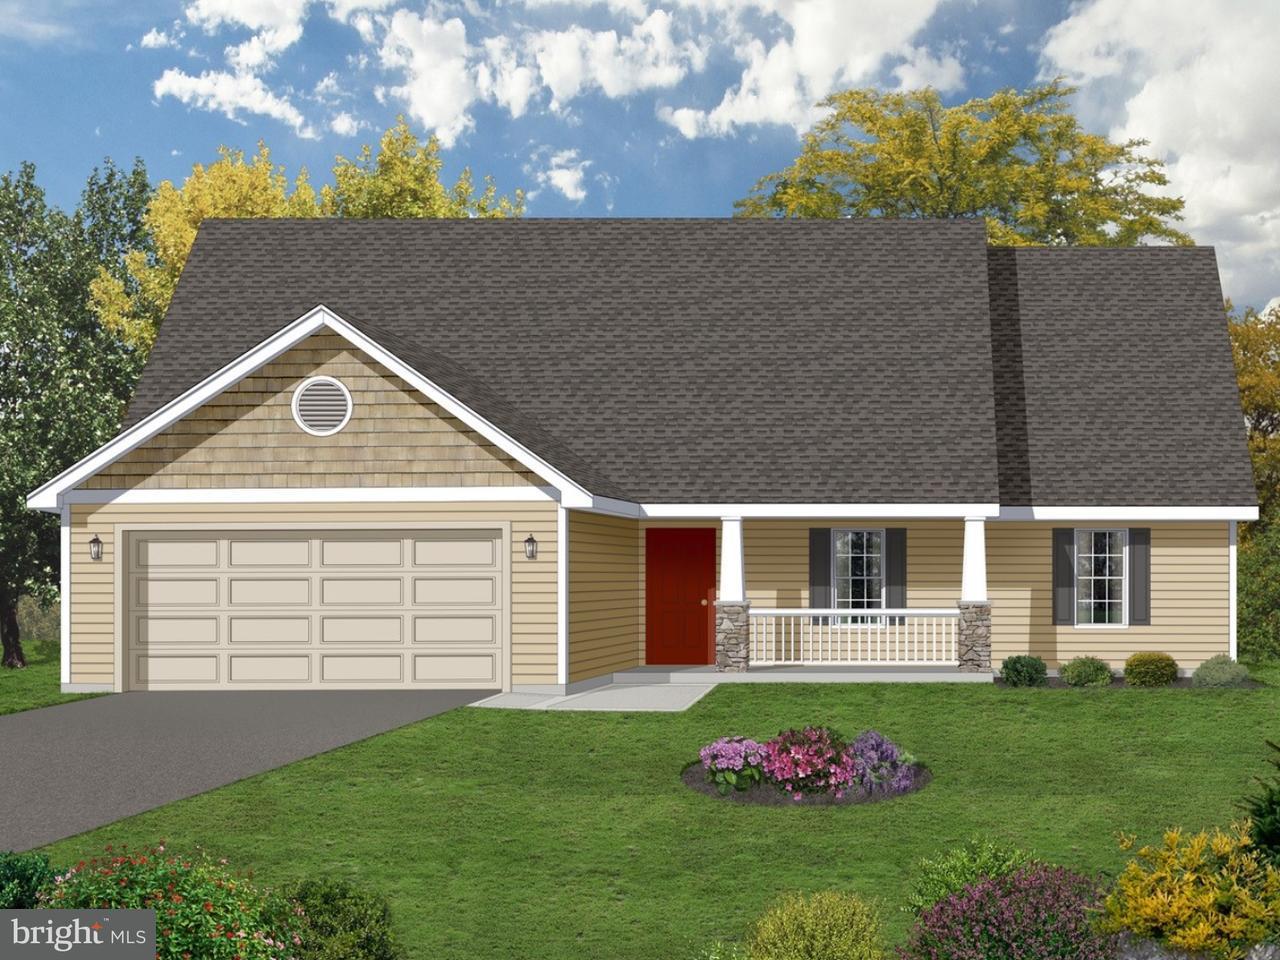 Single Family Home for Sale at 252 OWL CREEK Road Tamaqua, Pennsylvania 18252 United States